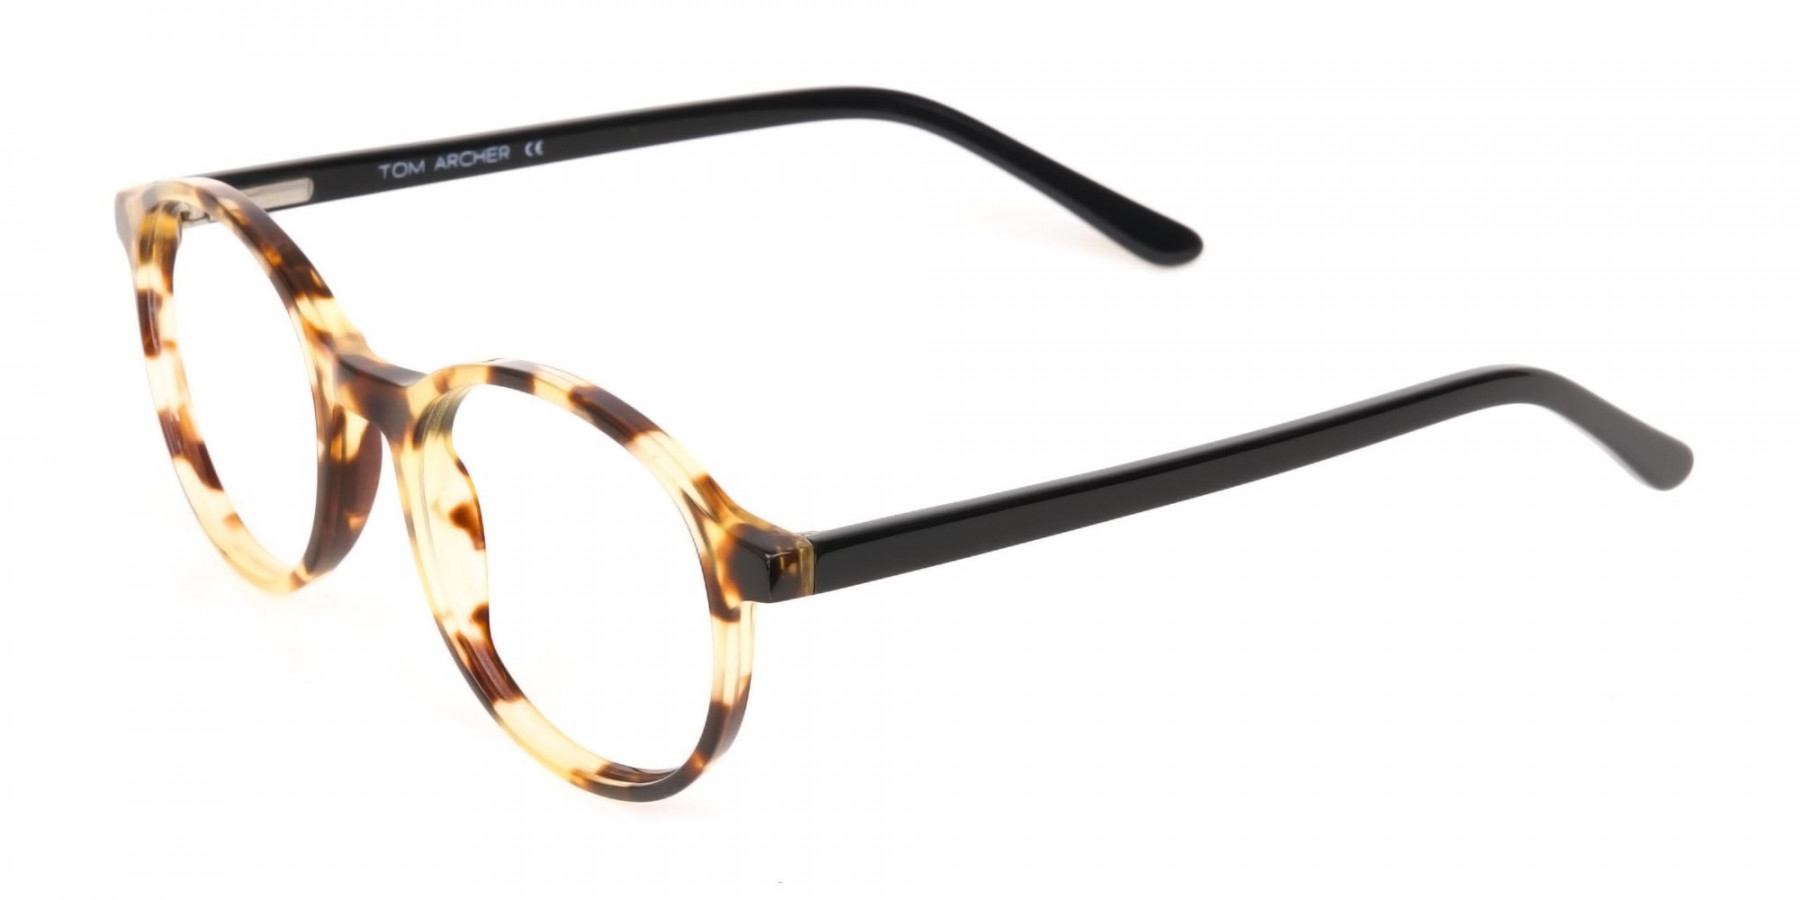 Tortoise and Black Round Eyeglasses Frame Unisex-1